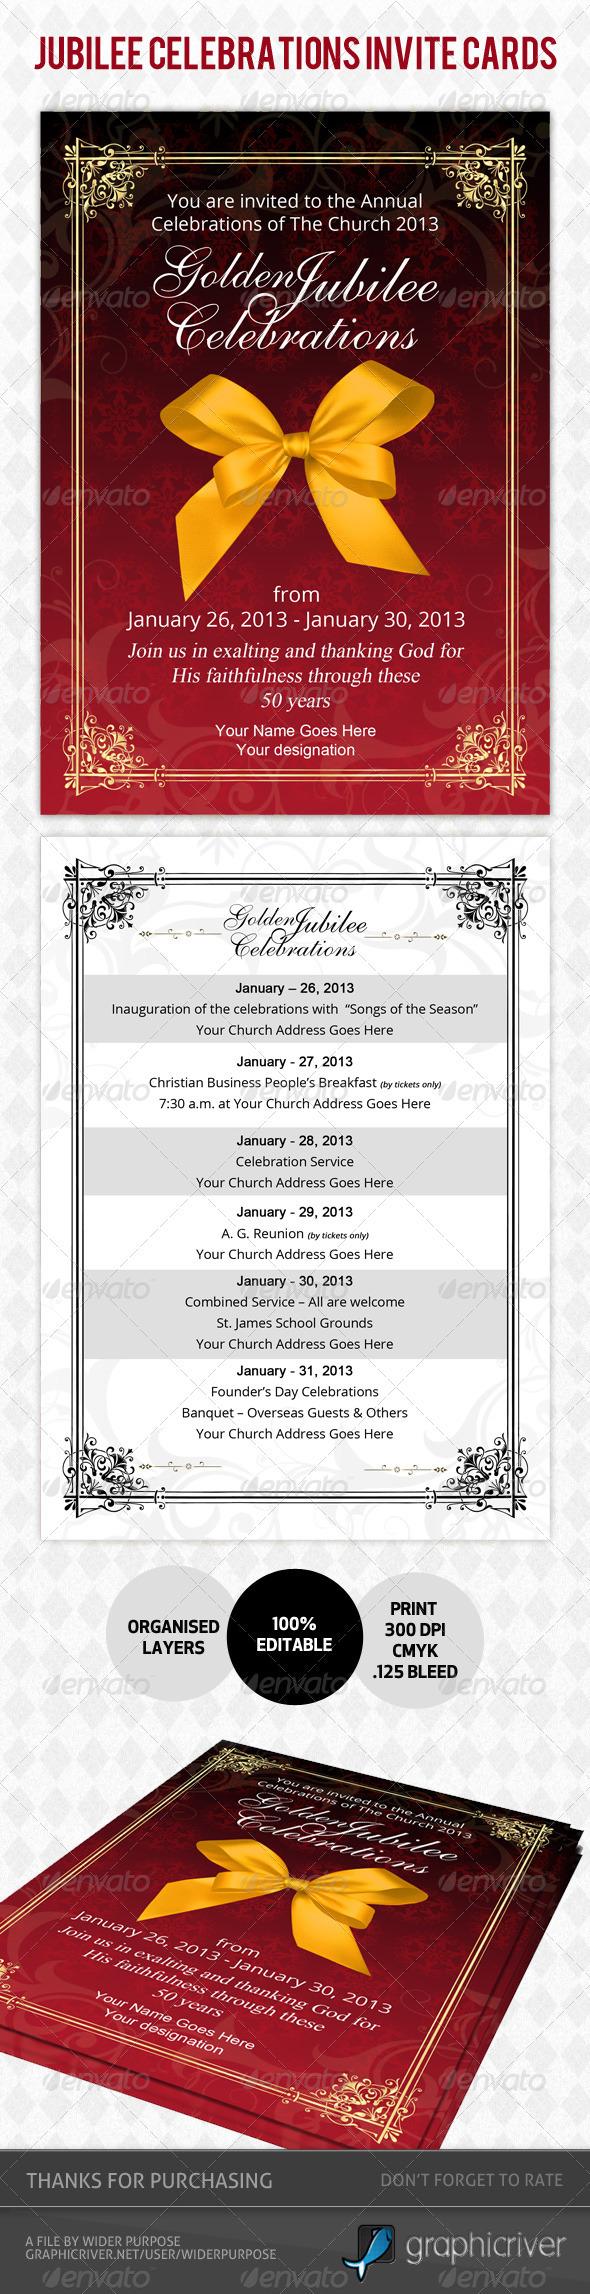 Golden Jubilee Invitation Card Psd Template - Invitations Cards & Invites